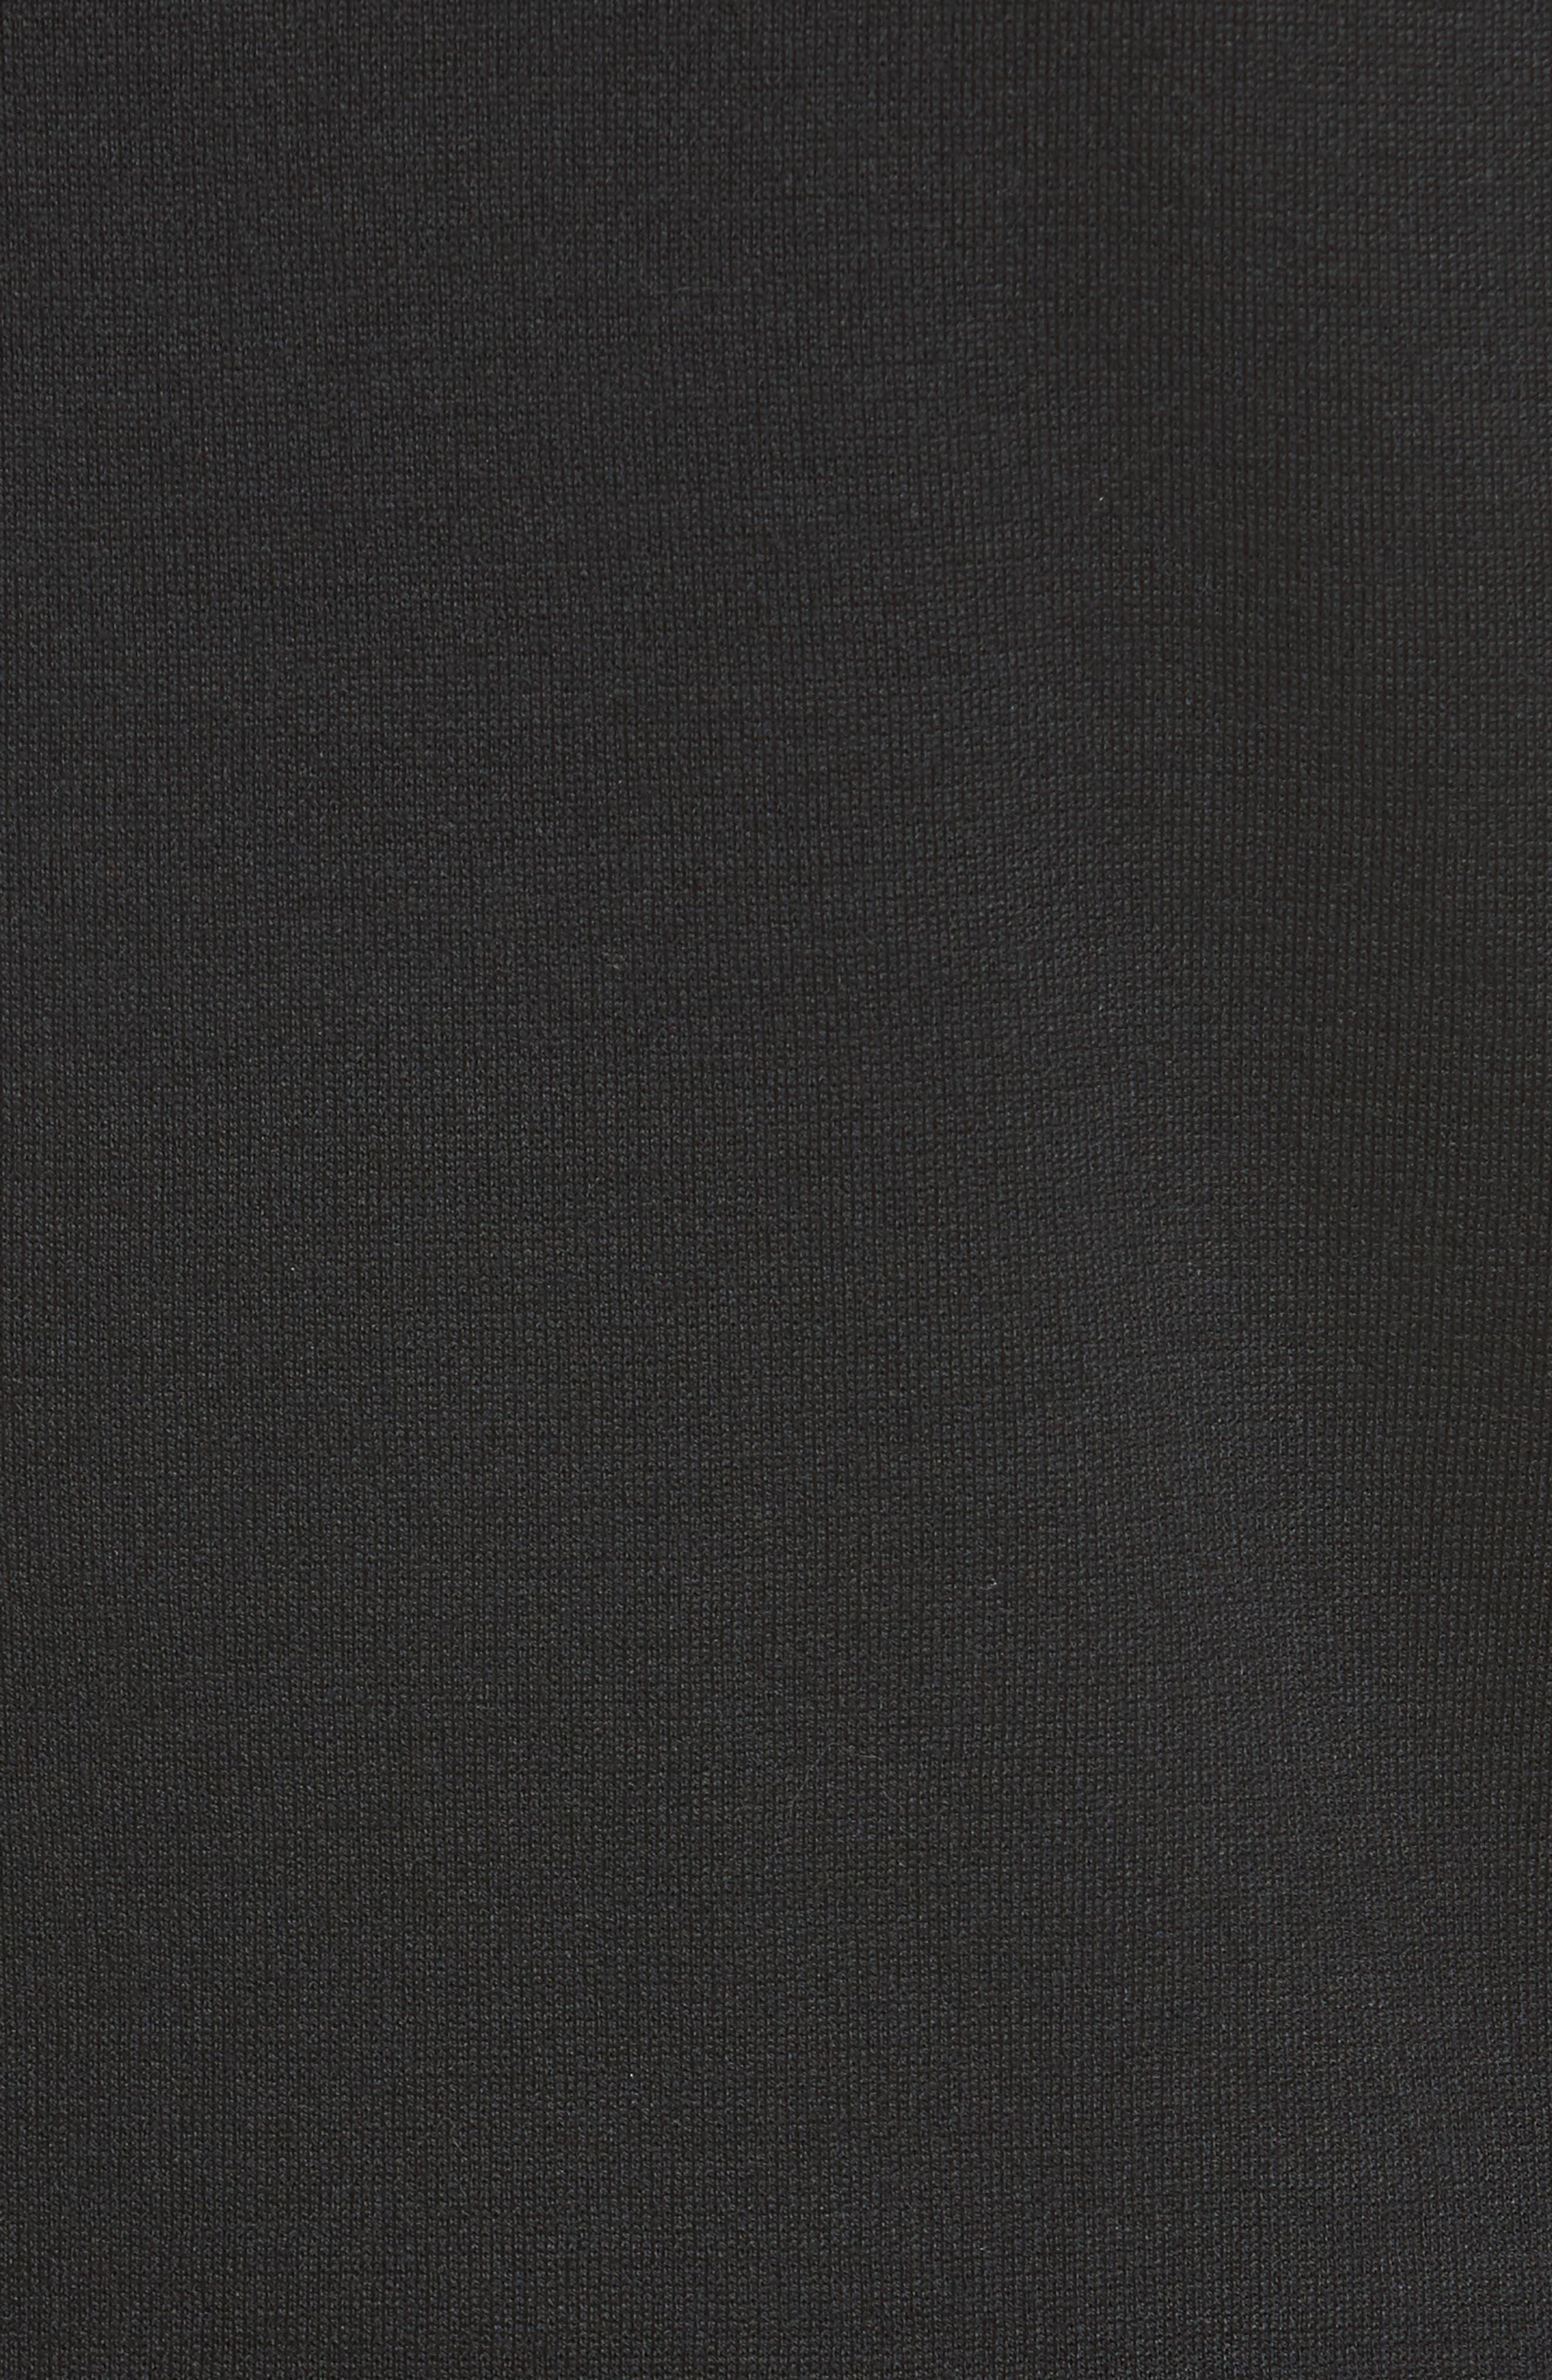 Eyelash Pebble Dash Tweed Knit Jacket,                             Alternate thumbnail 6, color,                             001